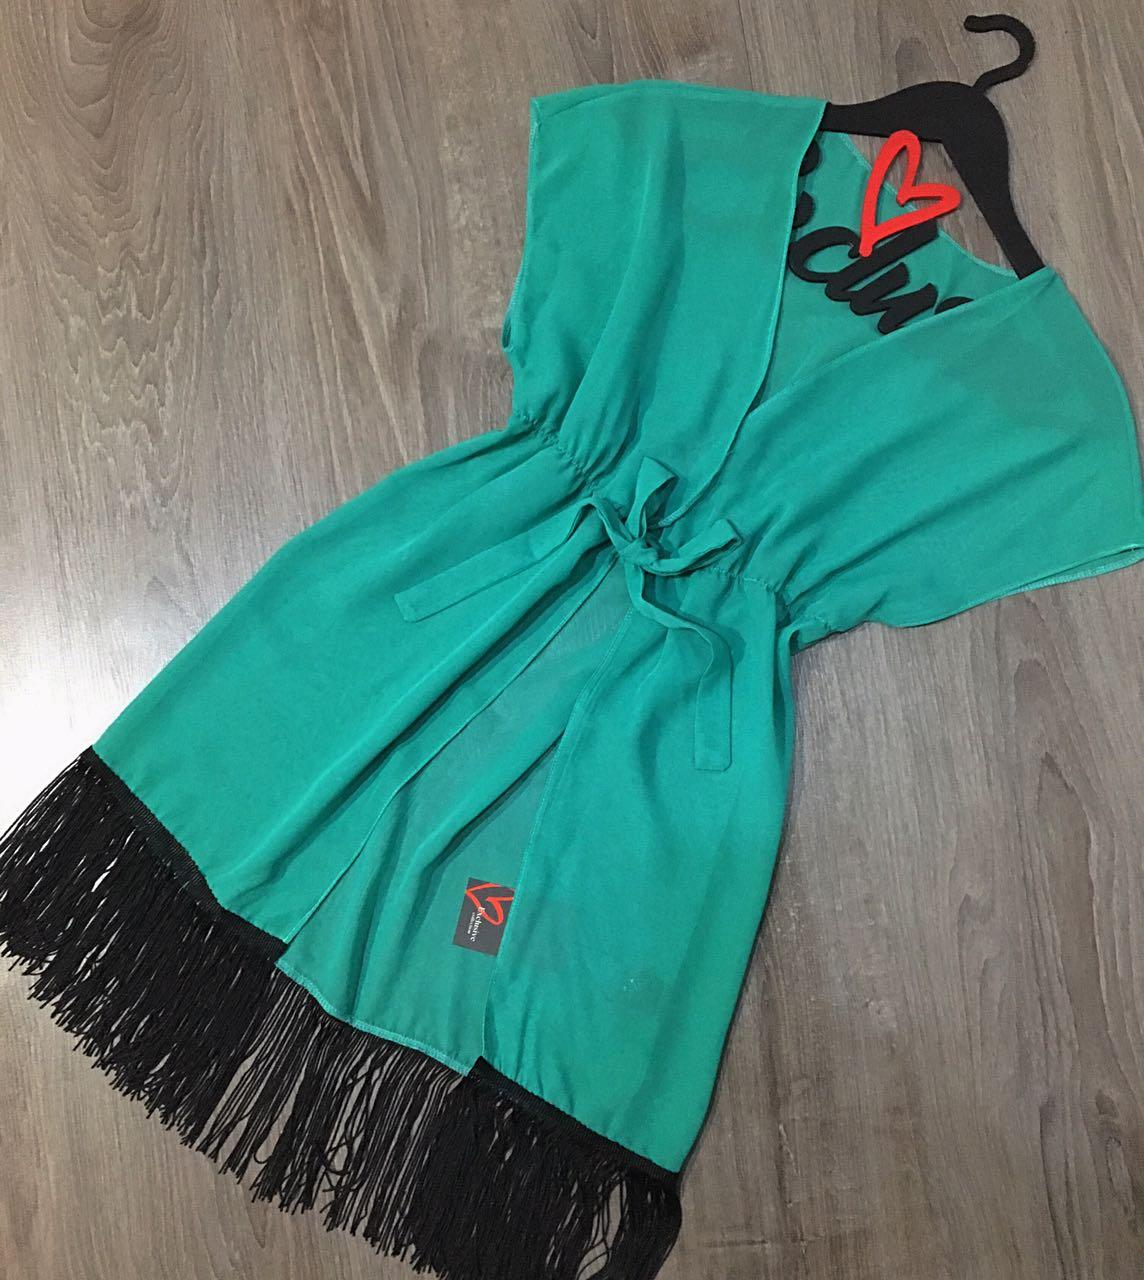 Пляжная одежда, женская яркая прозрачная туника